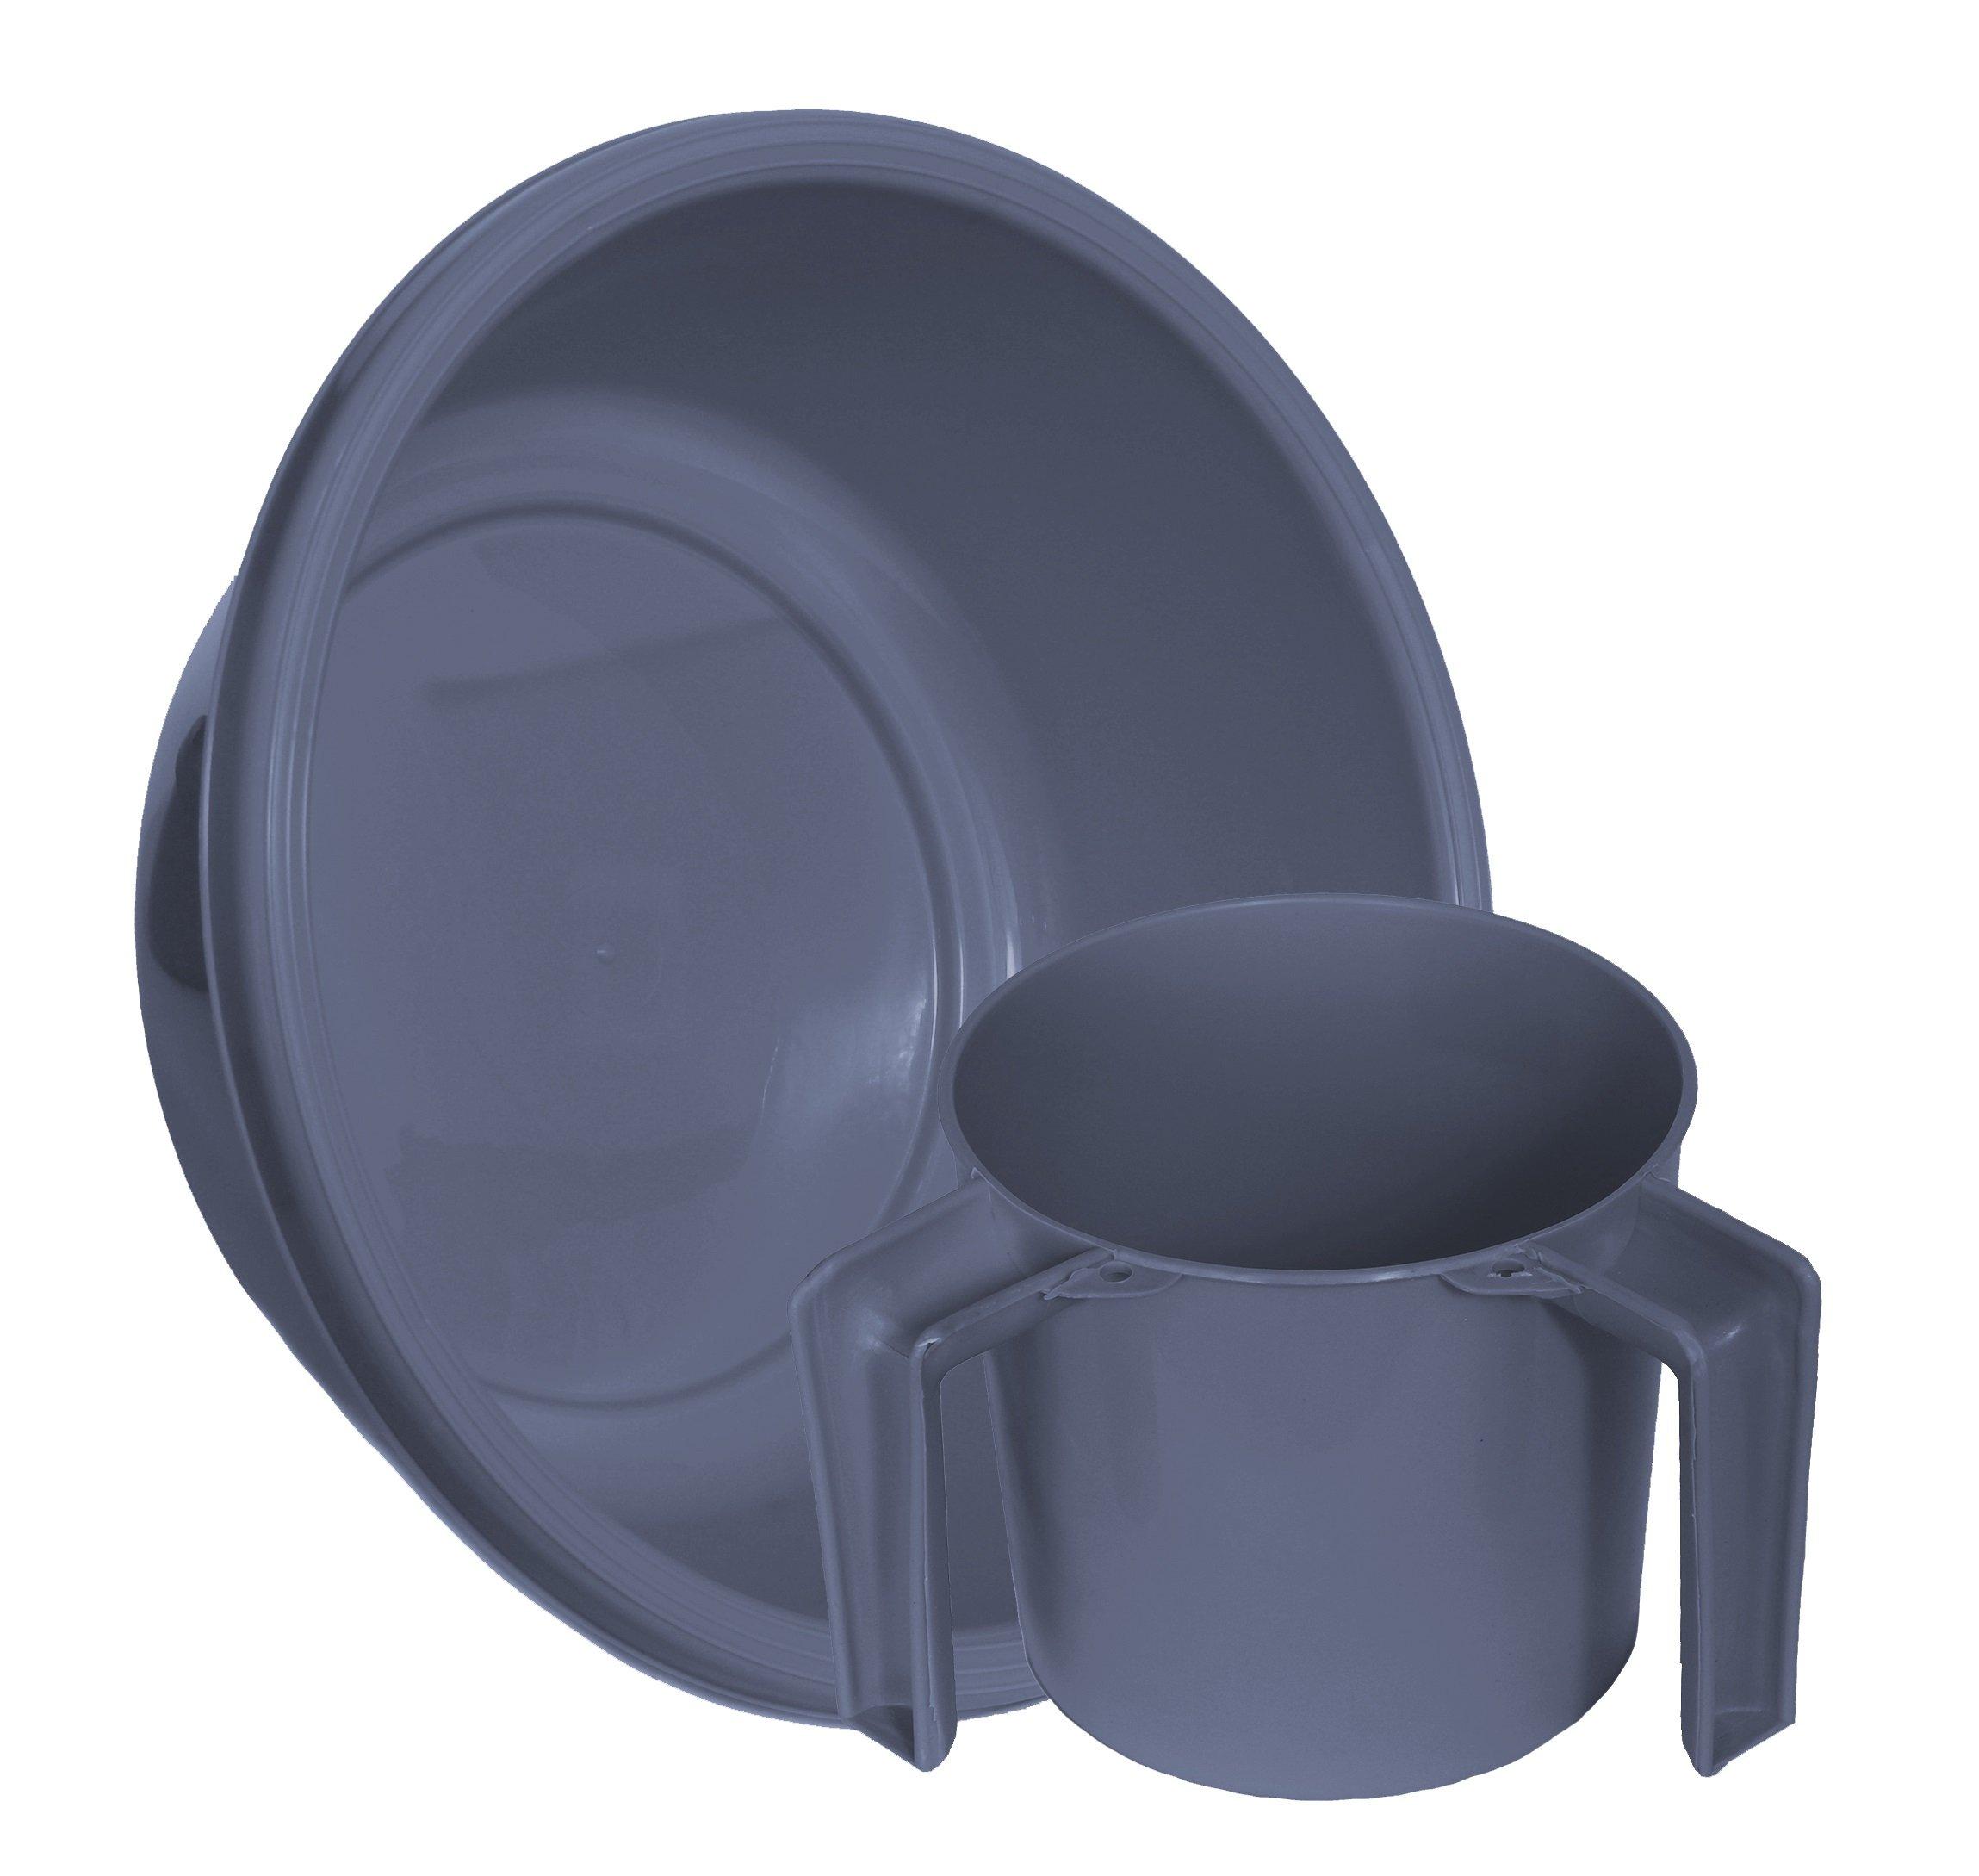 YBM Home Round Wash Cup & Round Wash Basin Netilat Yadayim, Negel Vasser Set Ba157-1147set (1, Gray)